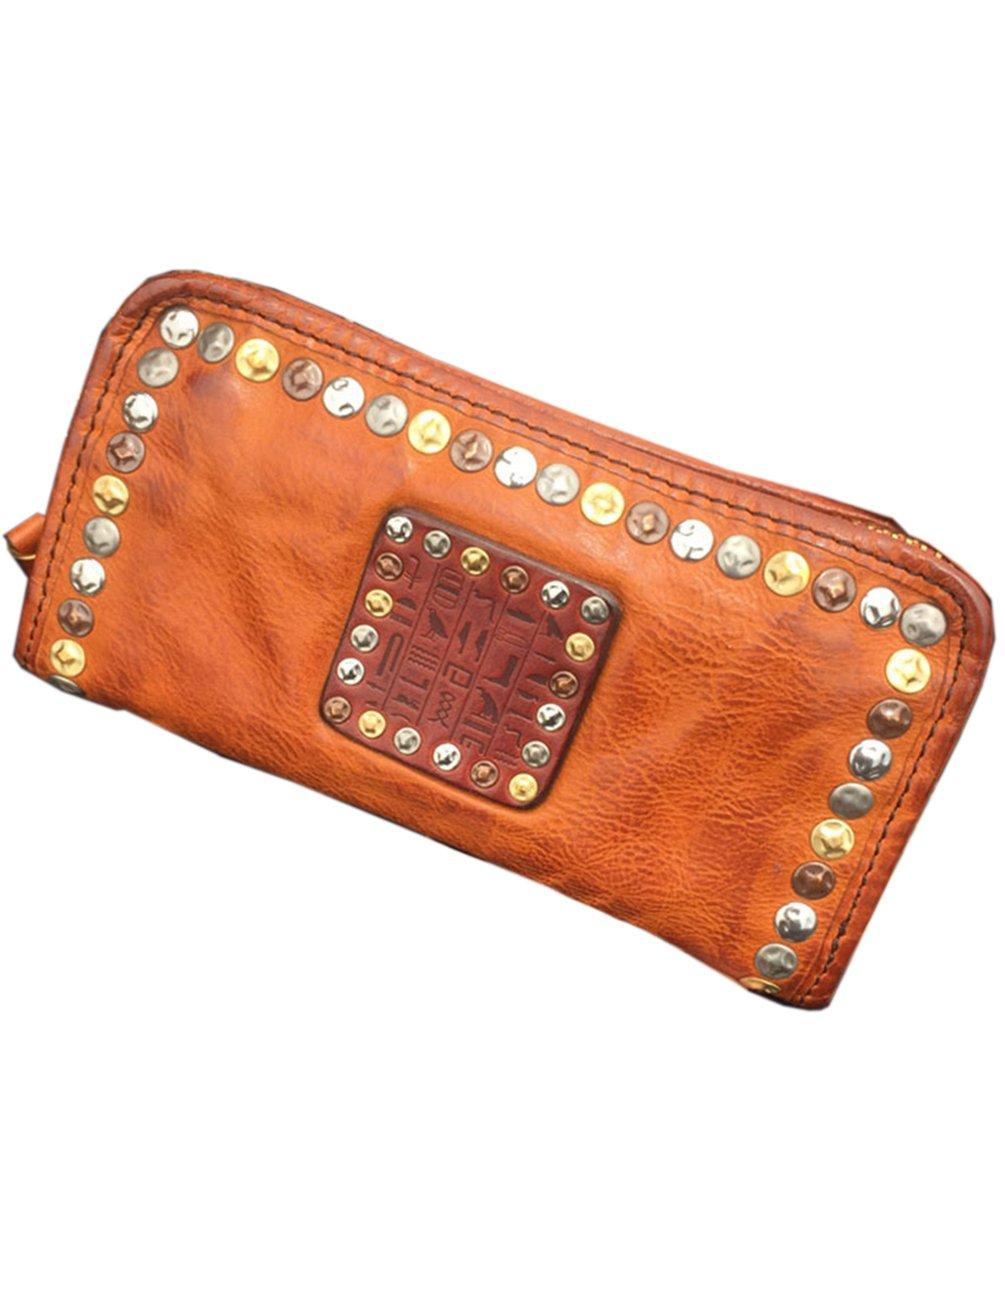 Menschwear Mens Genuine Leather Designer Wallet Credit Card Holder Purse Yellow